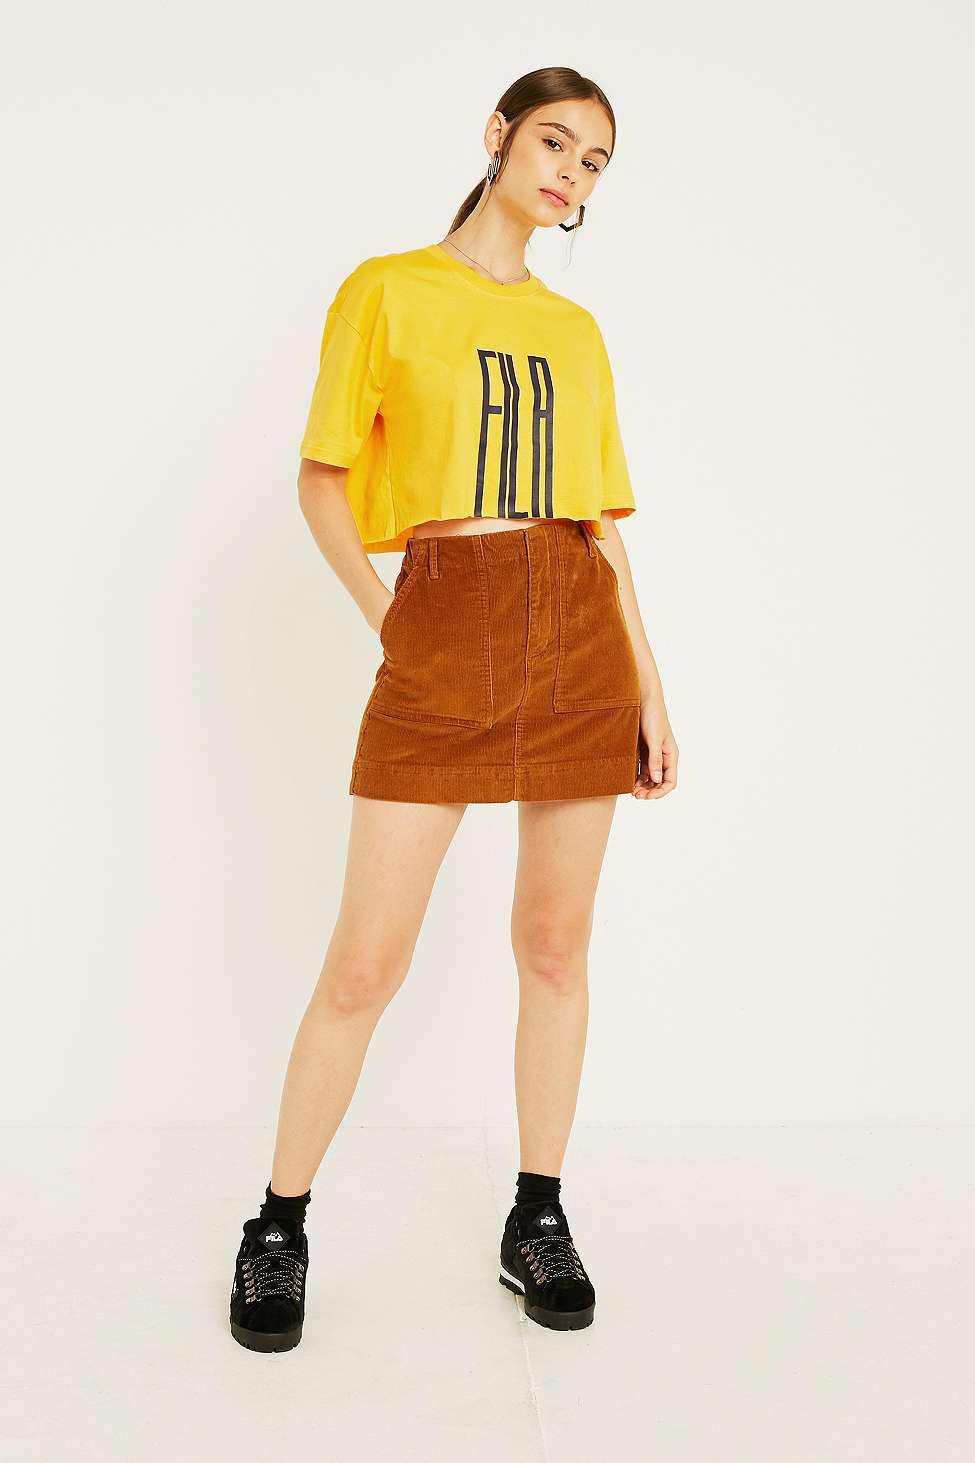 51dc5d65e Fila Domenica Crop T-shirt in Yellow - Lyst